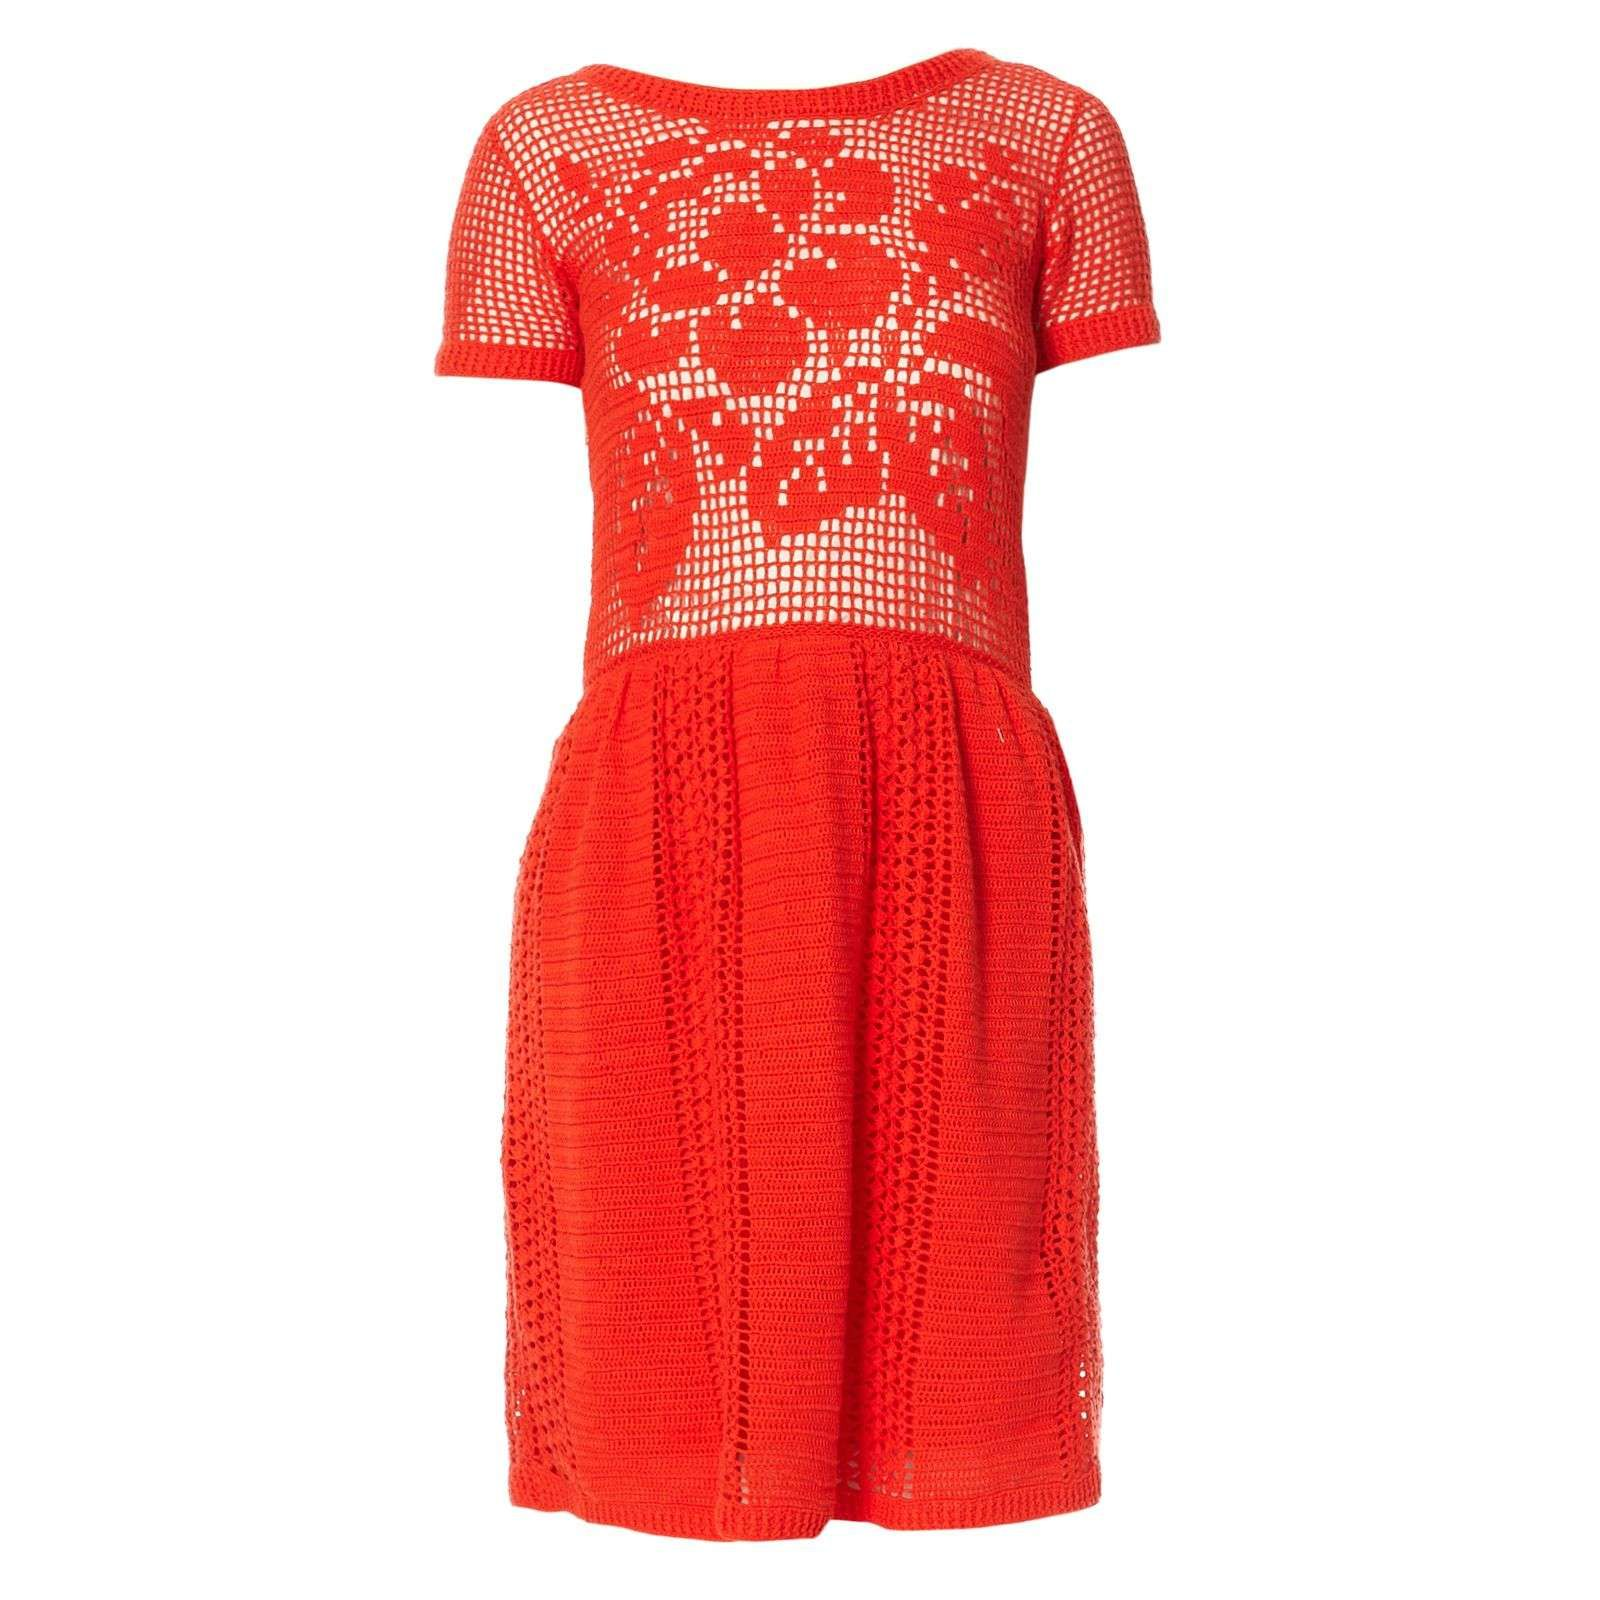 Robe courte - rouge - Manoush - Ref: 1534527 | Brandalley